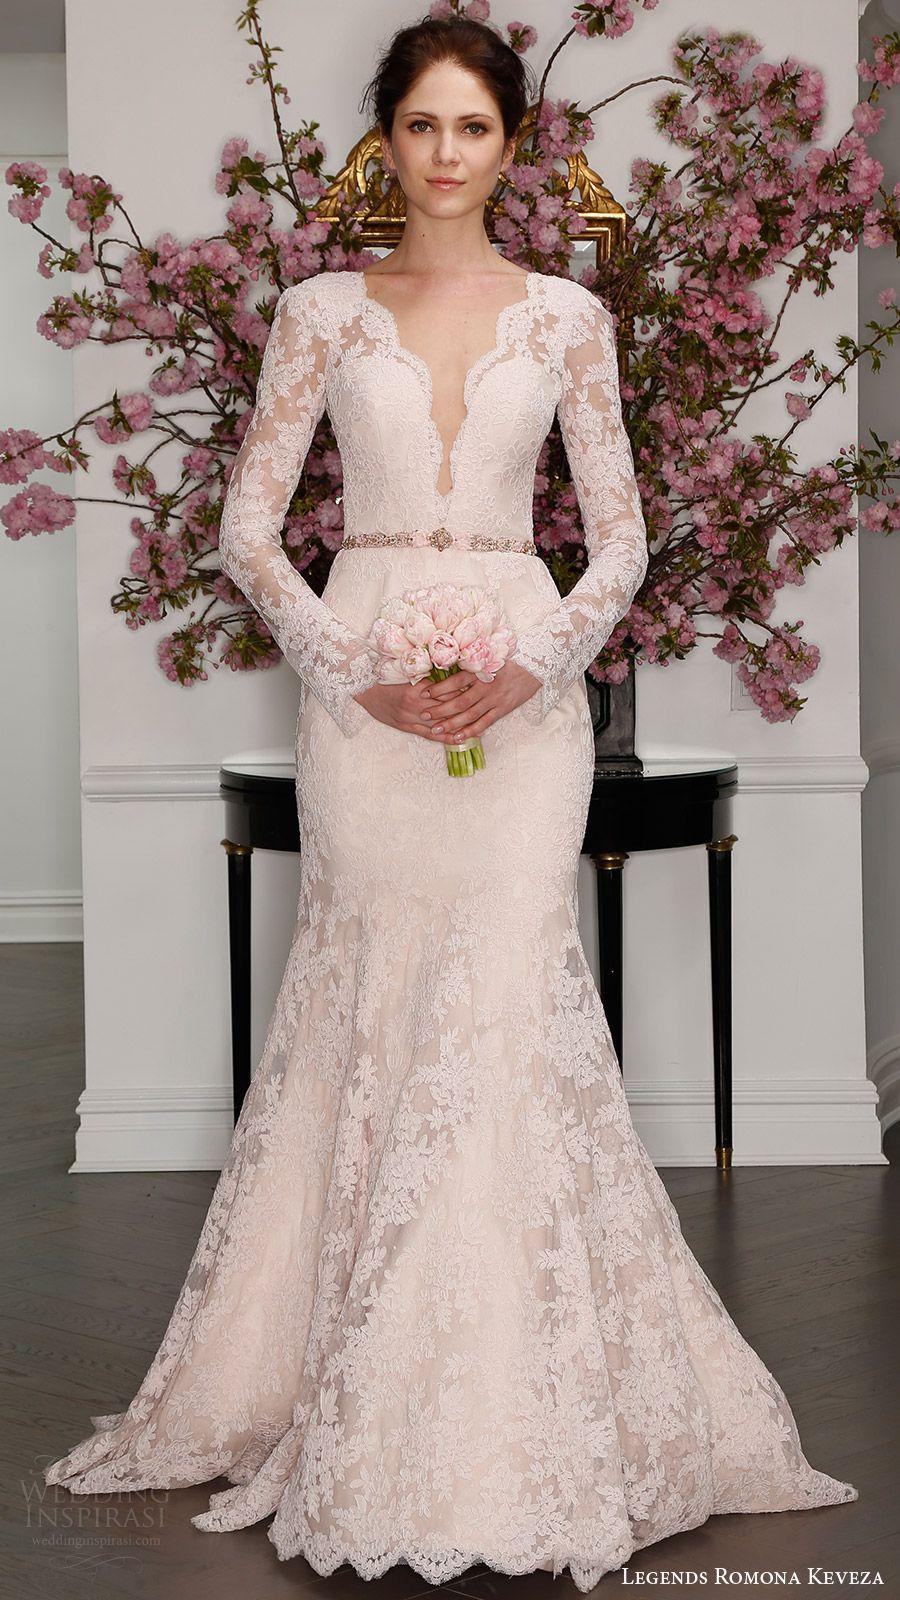 c2c517de103ea Legends Romona Keveza Spring 2017 Wedding Dresses | wedding gowns ...